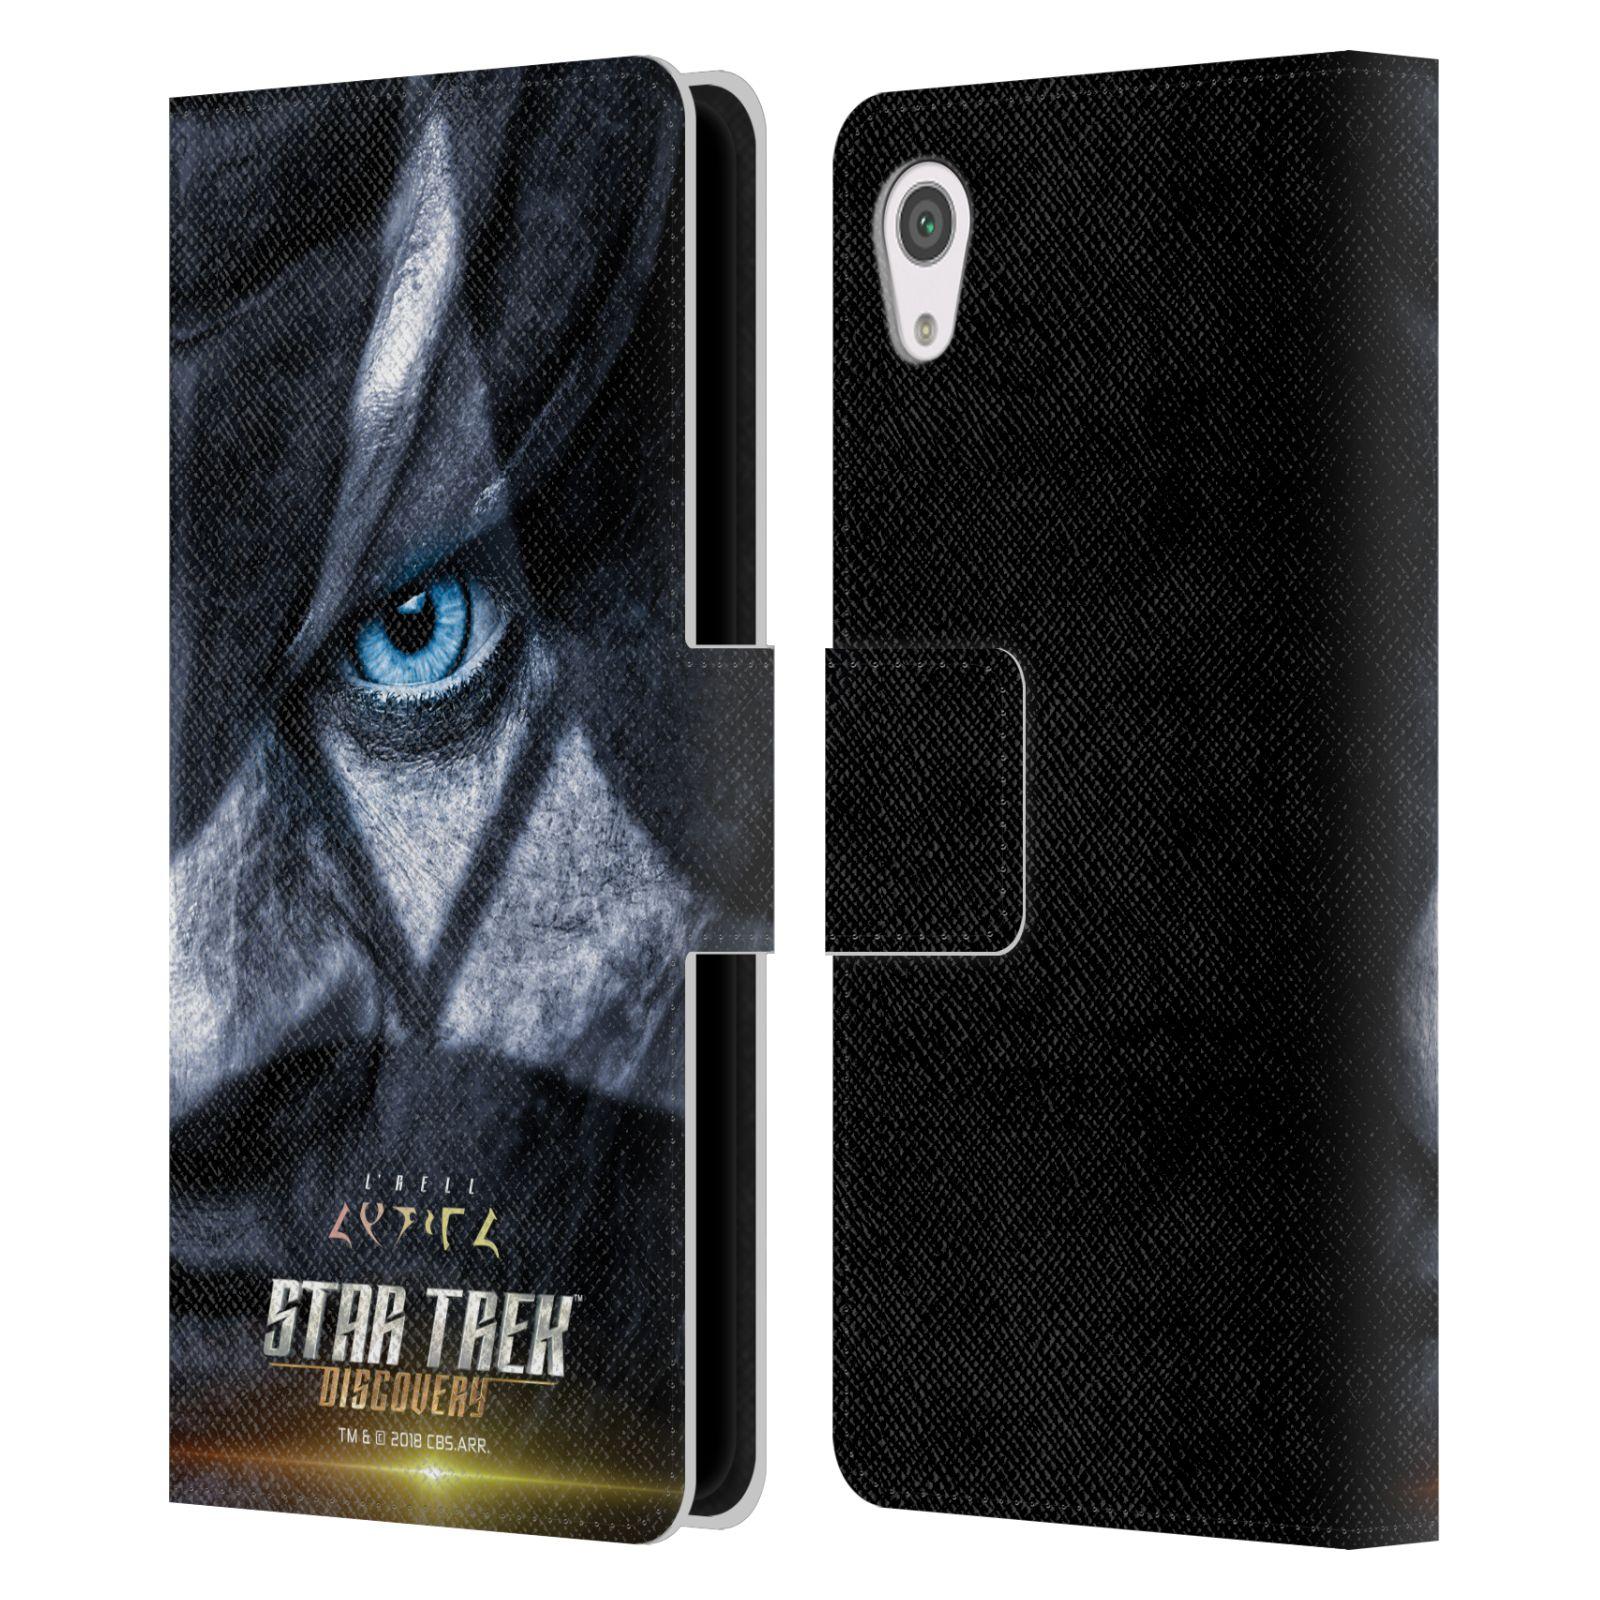 STAR-TREK-DISCOVERY-carteles-de-Cuero-Funda-cartera-libro-de-caracteres-para-telefonos-SONY-1